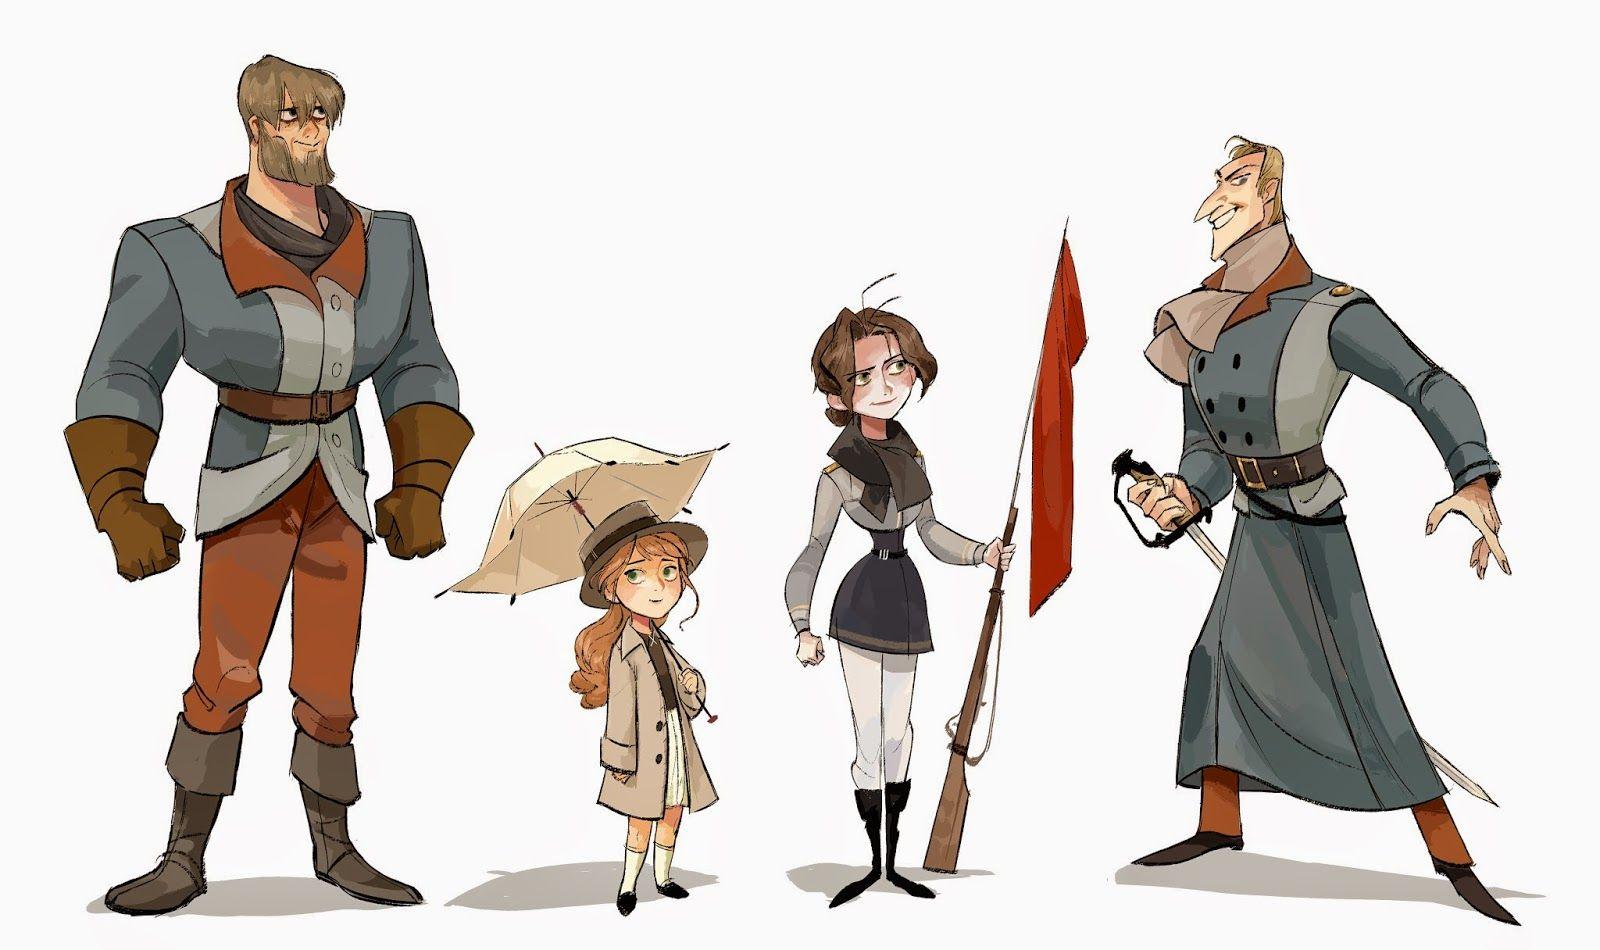 Animation Character Design Portfolio : Mirae works mirae yi character design portfolio character